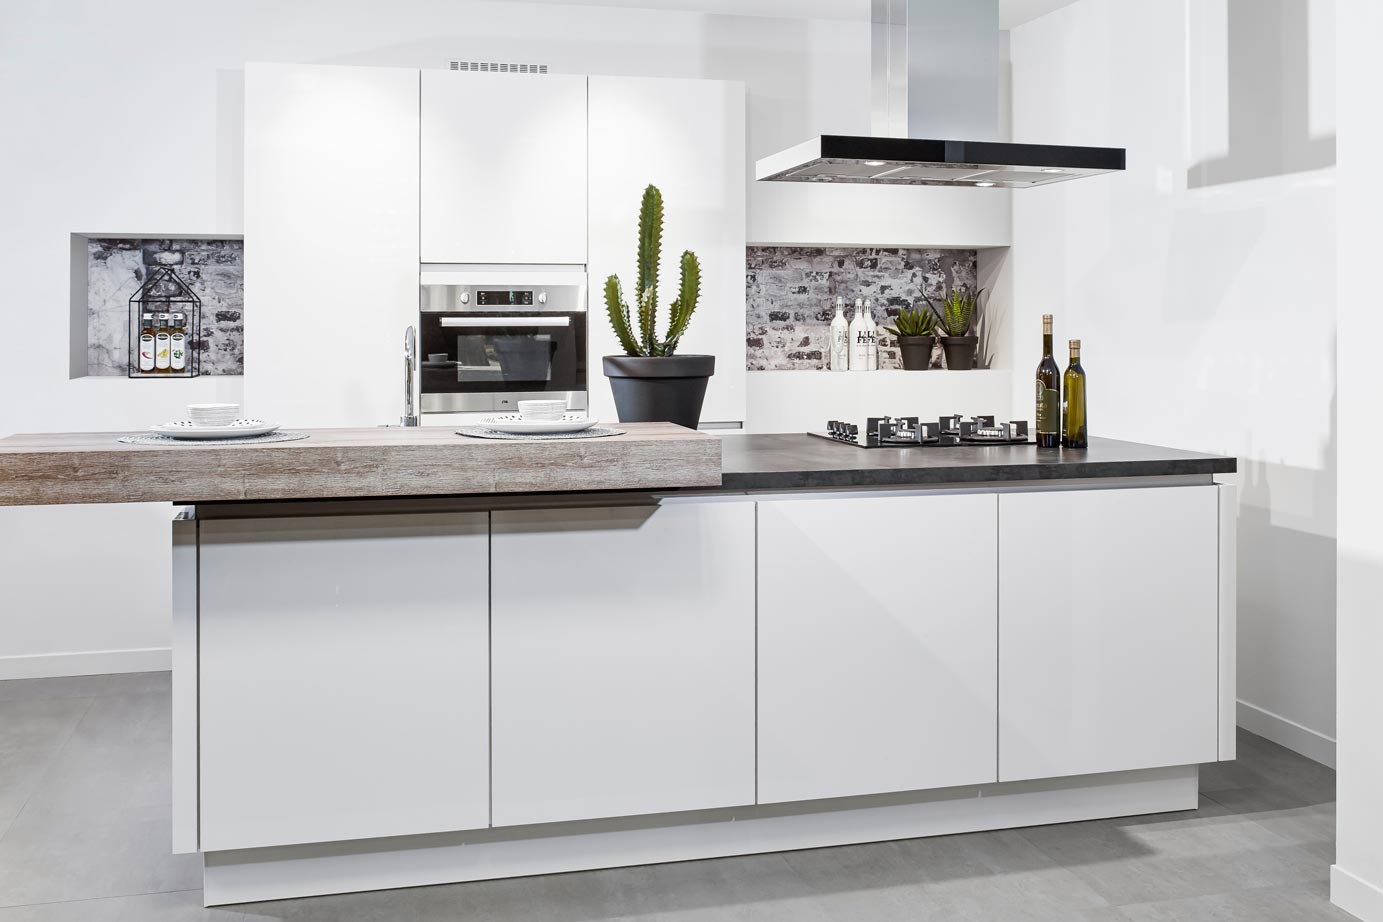 Greeploze Eiland Keukens : Moderne keuken met eiland DBasic line DB Keukens